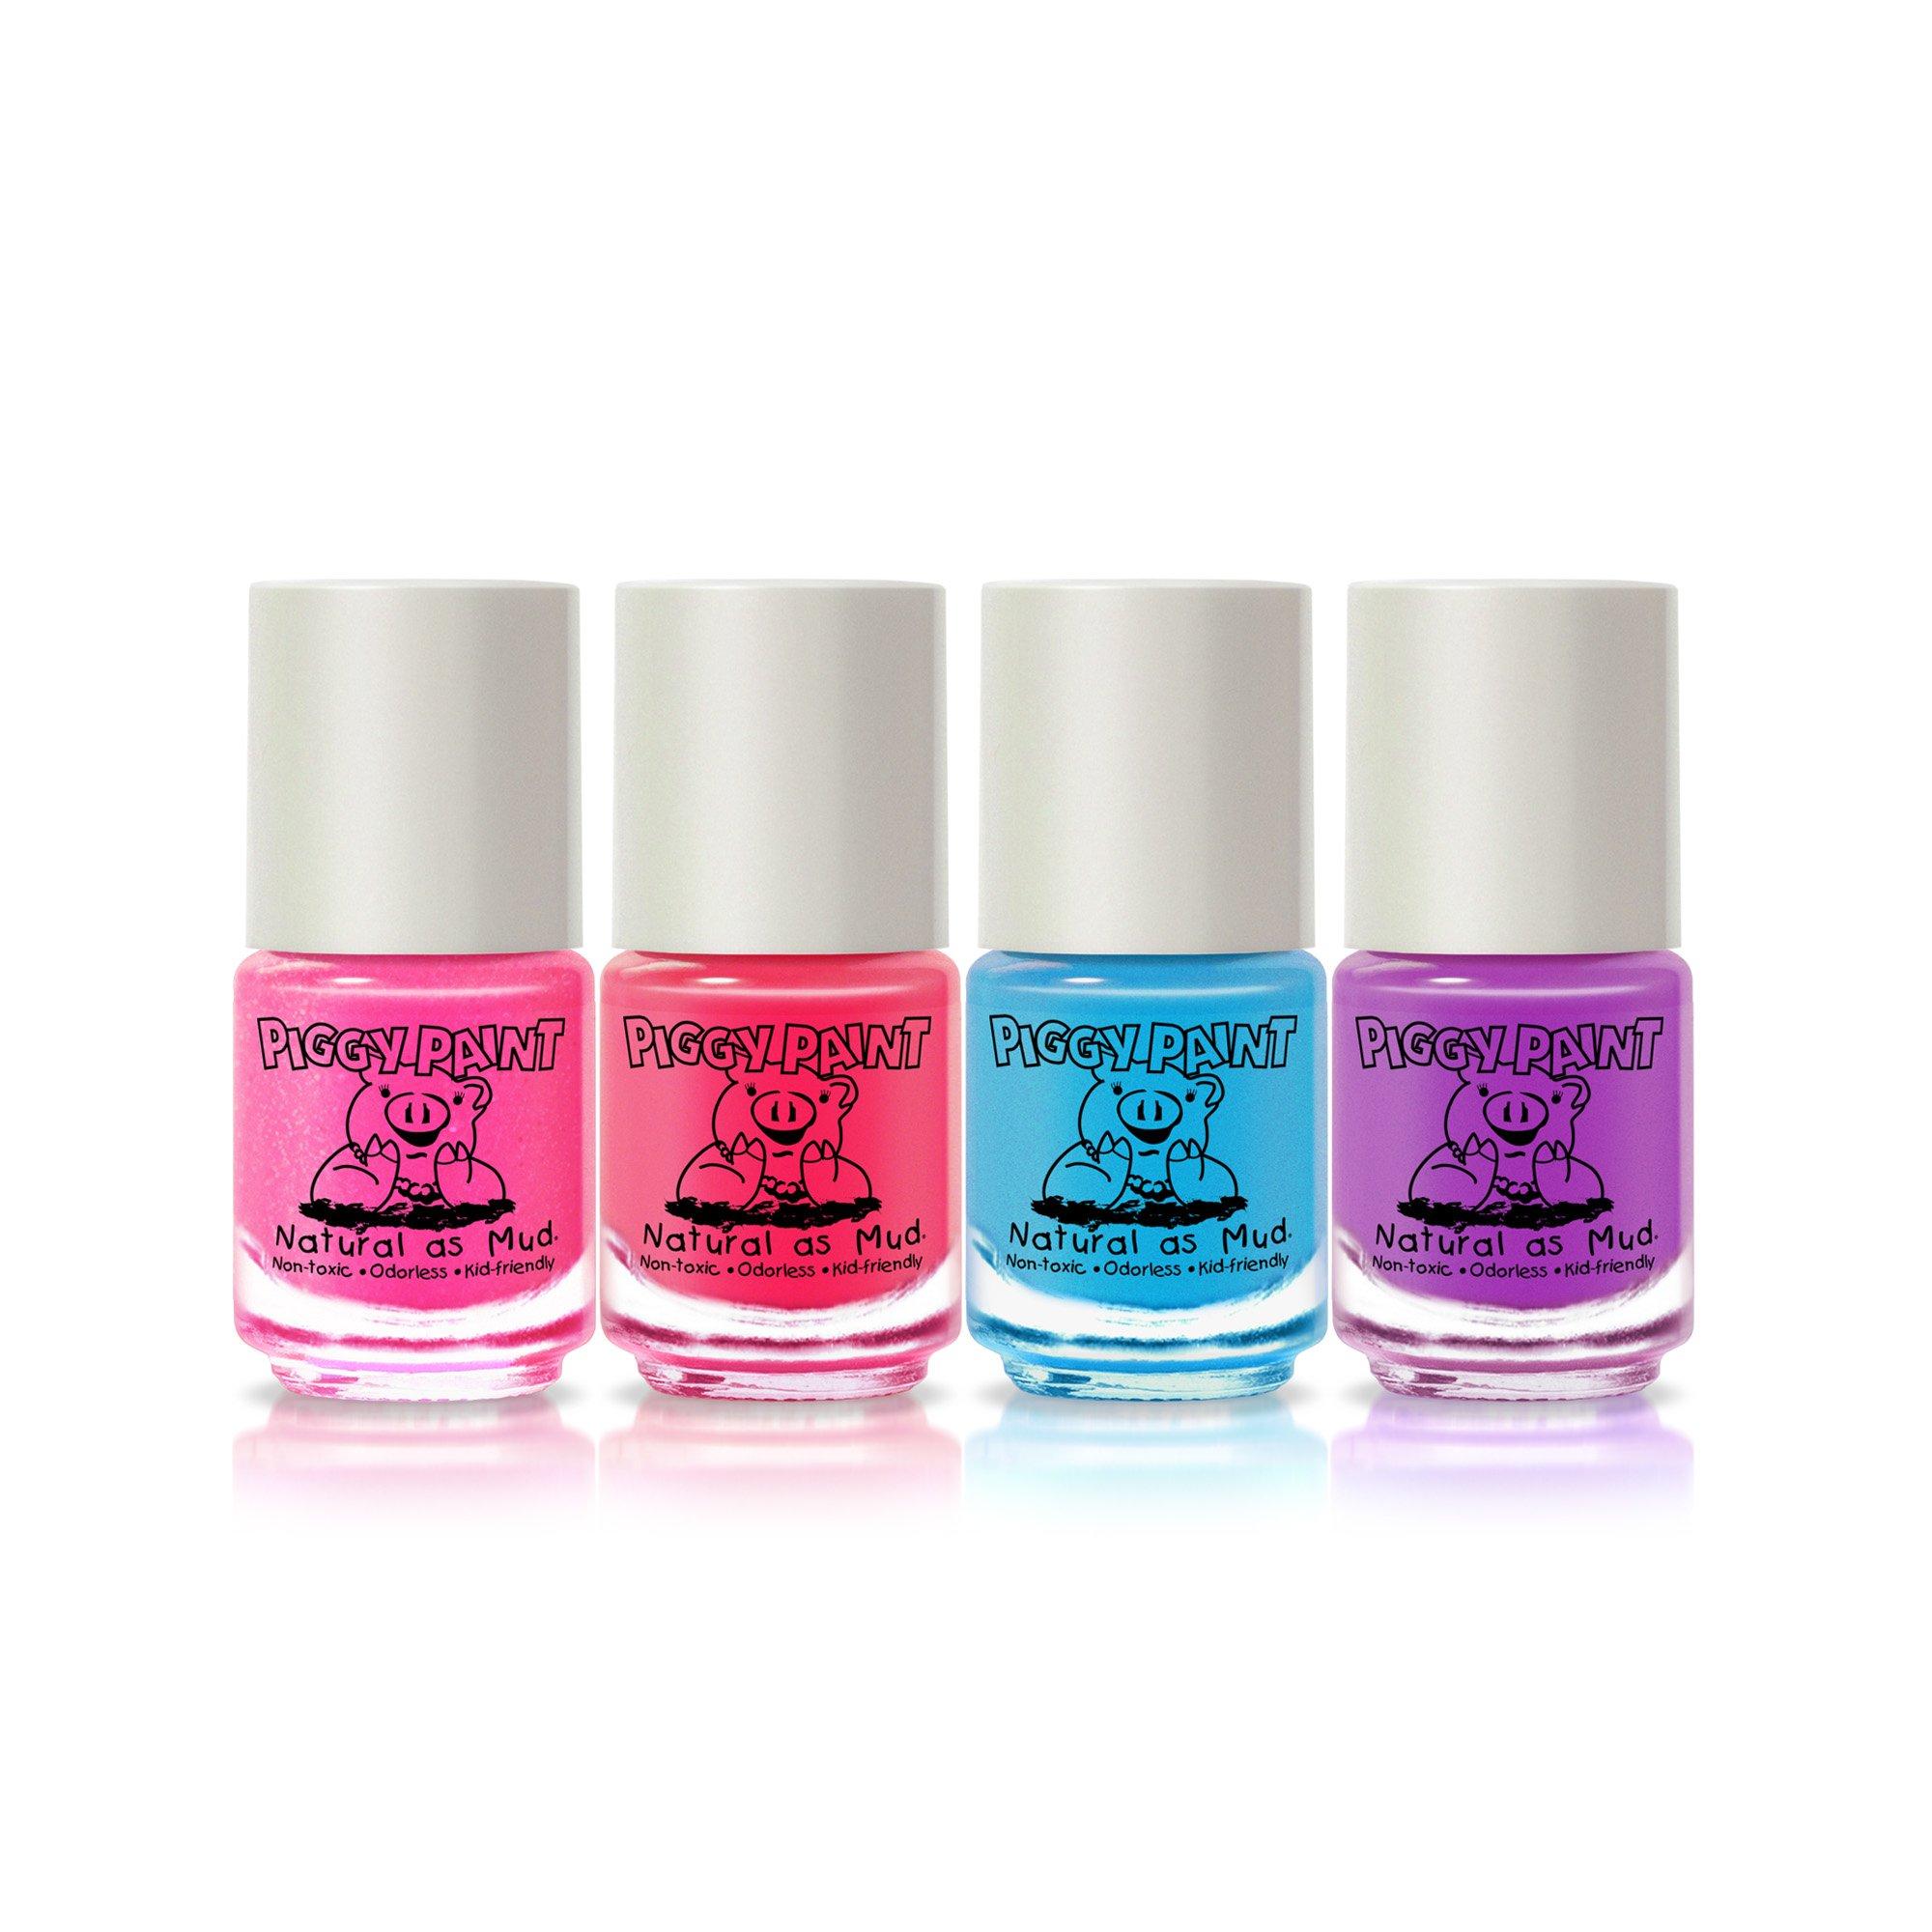 Piggy Paint - 100% Non-toxic Girls Nail Polish, Safe, Chemical Free ...